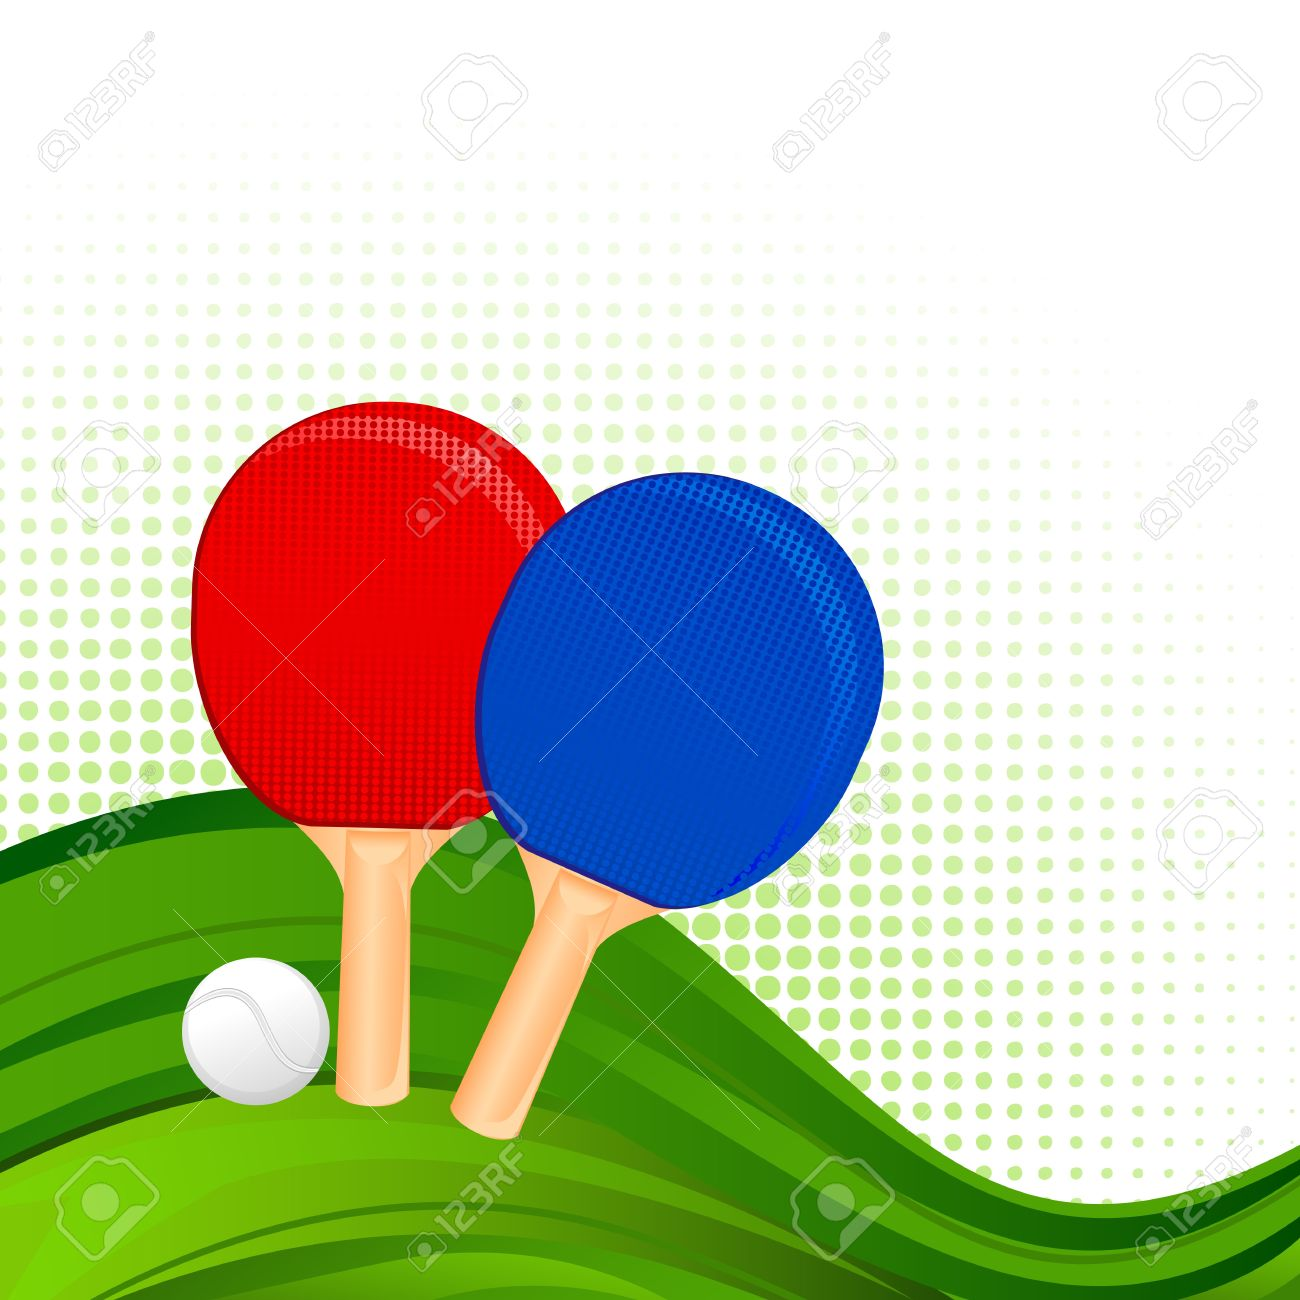 Ping-Pong Rackets and Ball Stock Vector - 18810800